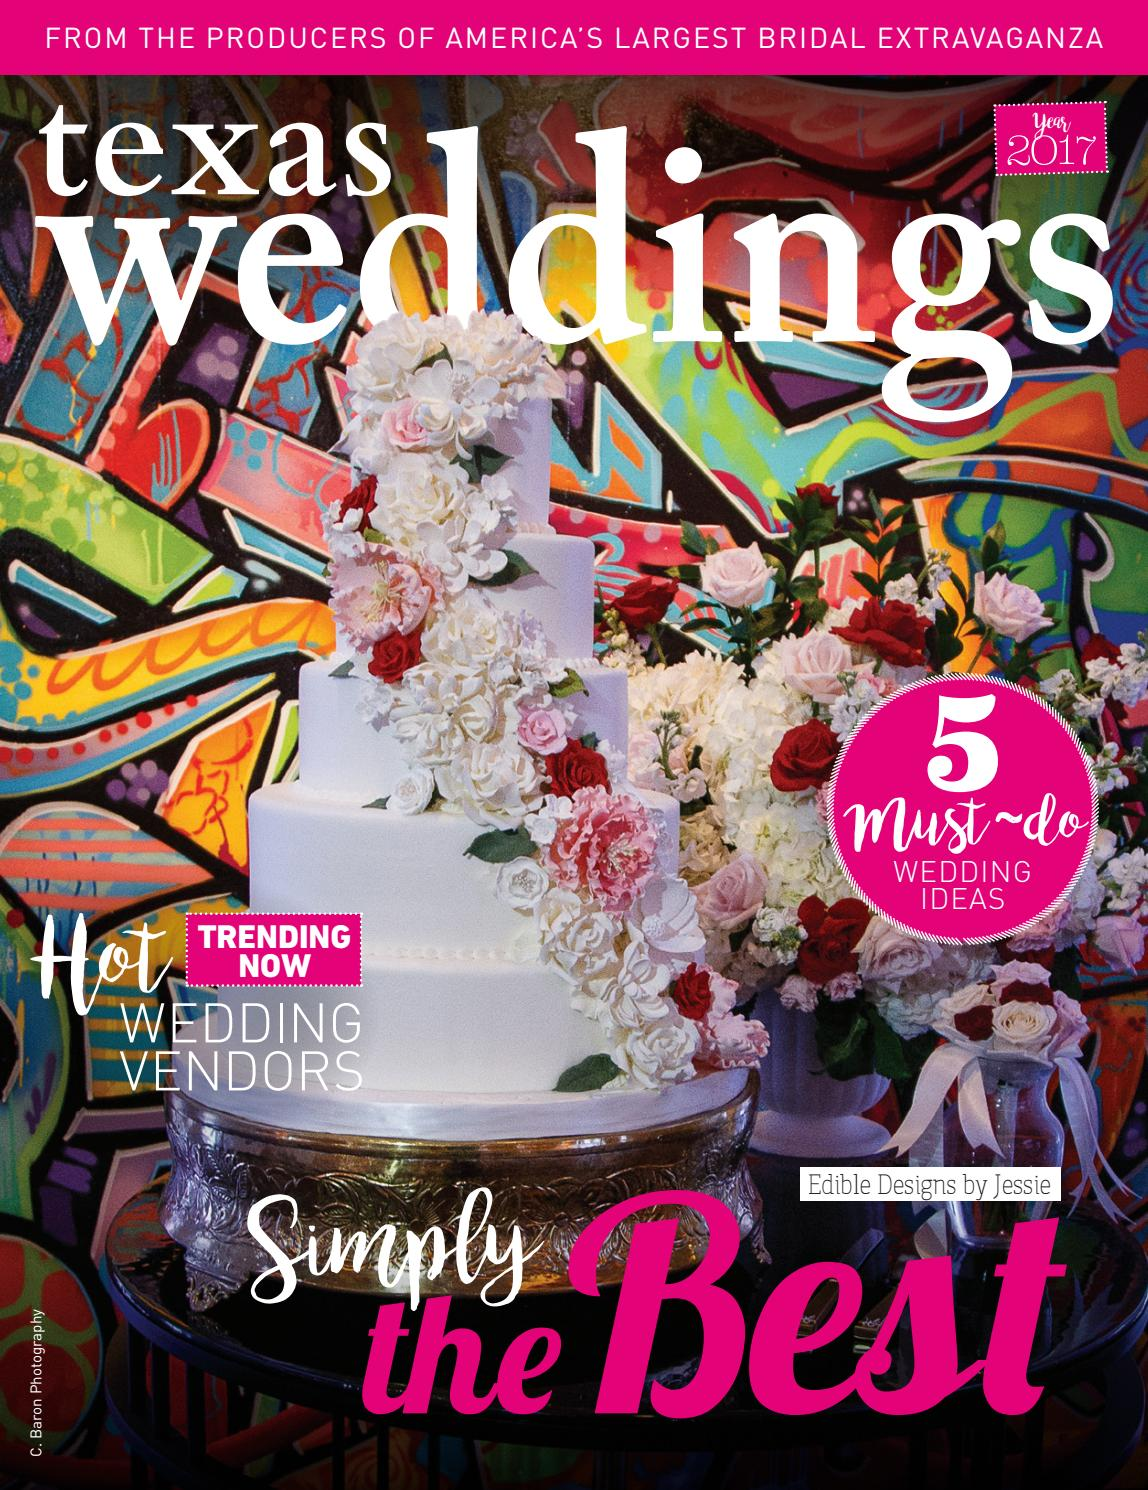 1c6e7801edf482 Edible Designs by Jessie on Texas Weddings by Bridal Extravaganza ...